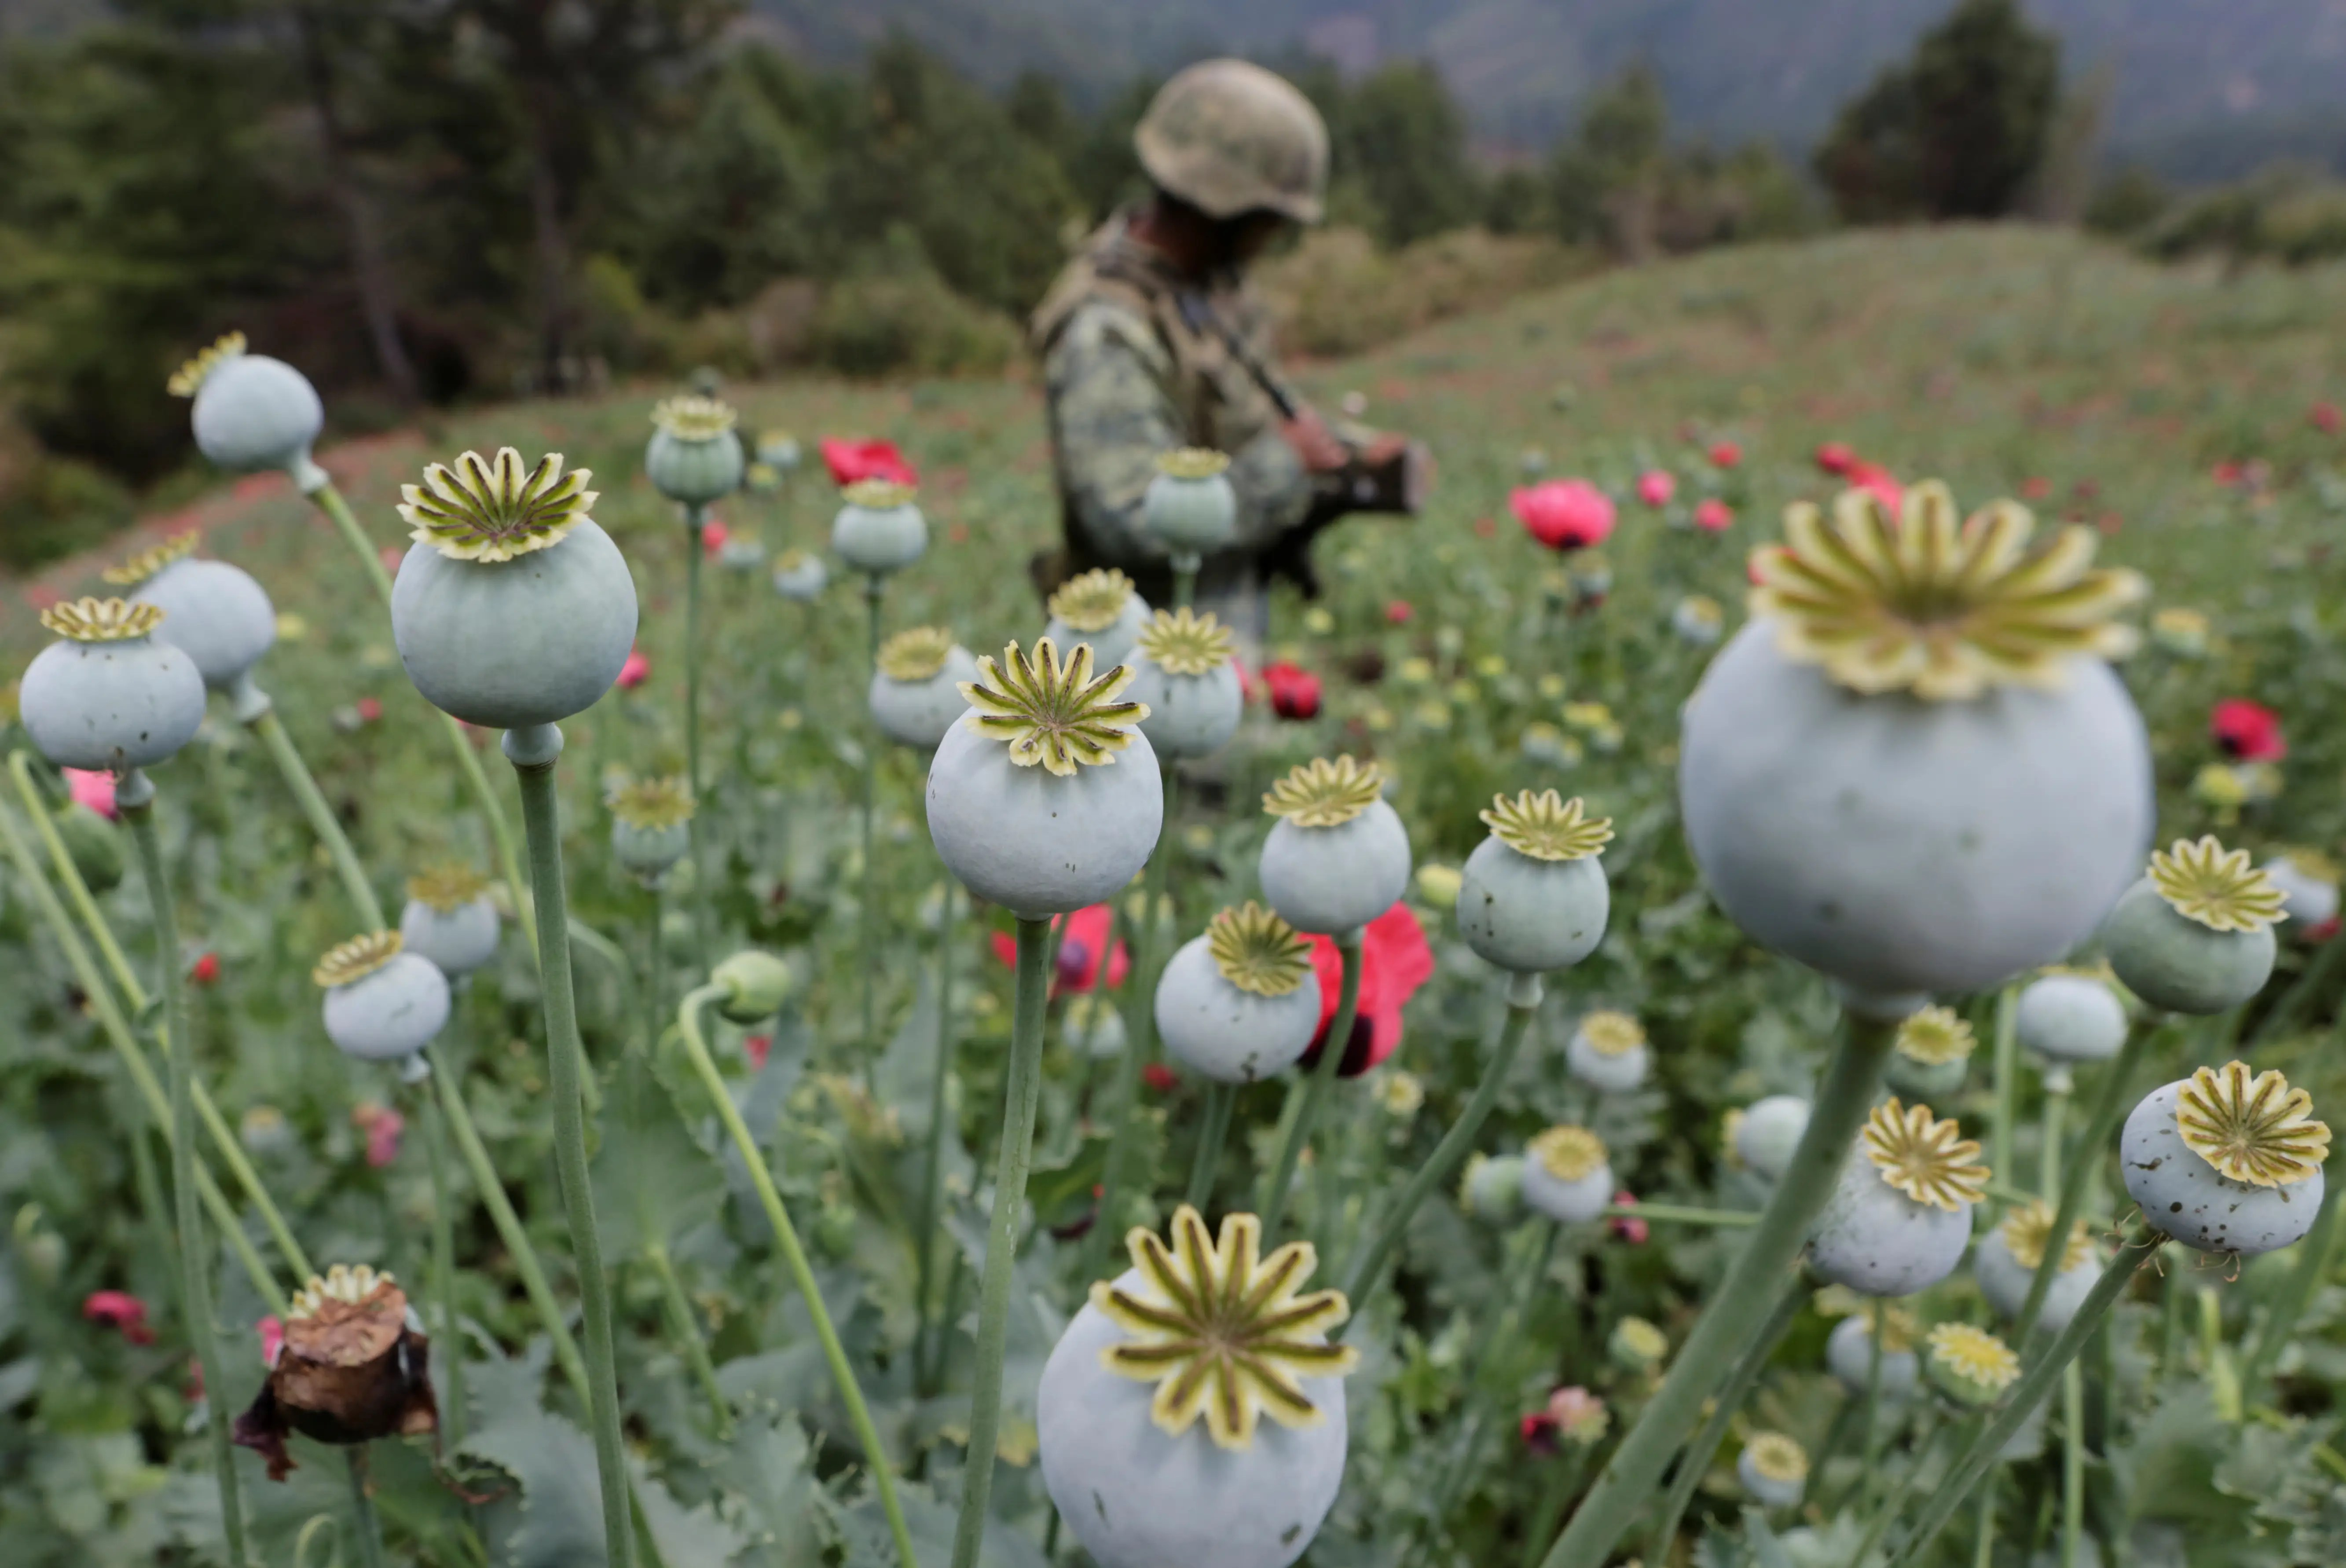 Mexico opium poppy plant eradication soldier